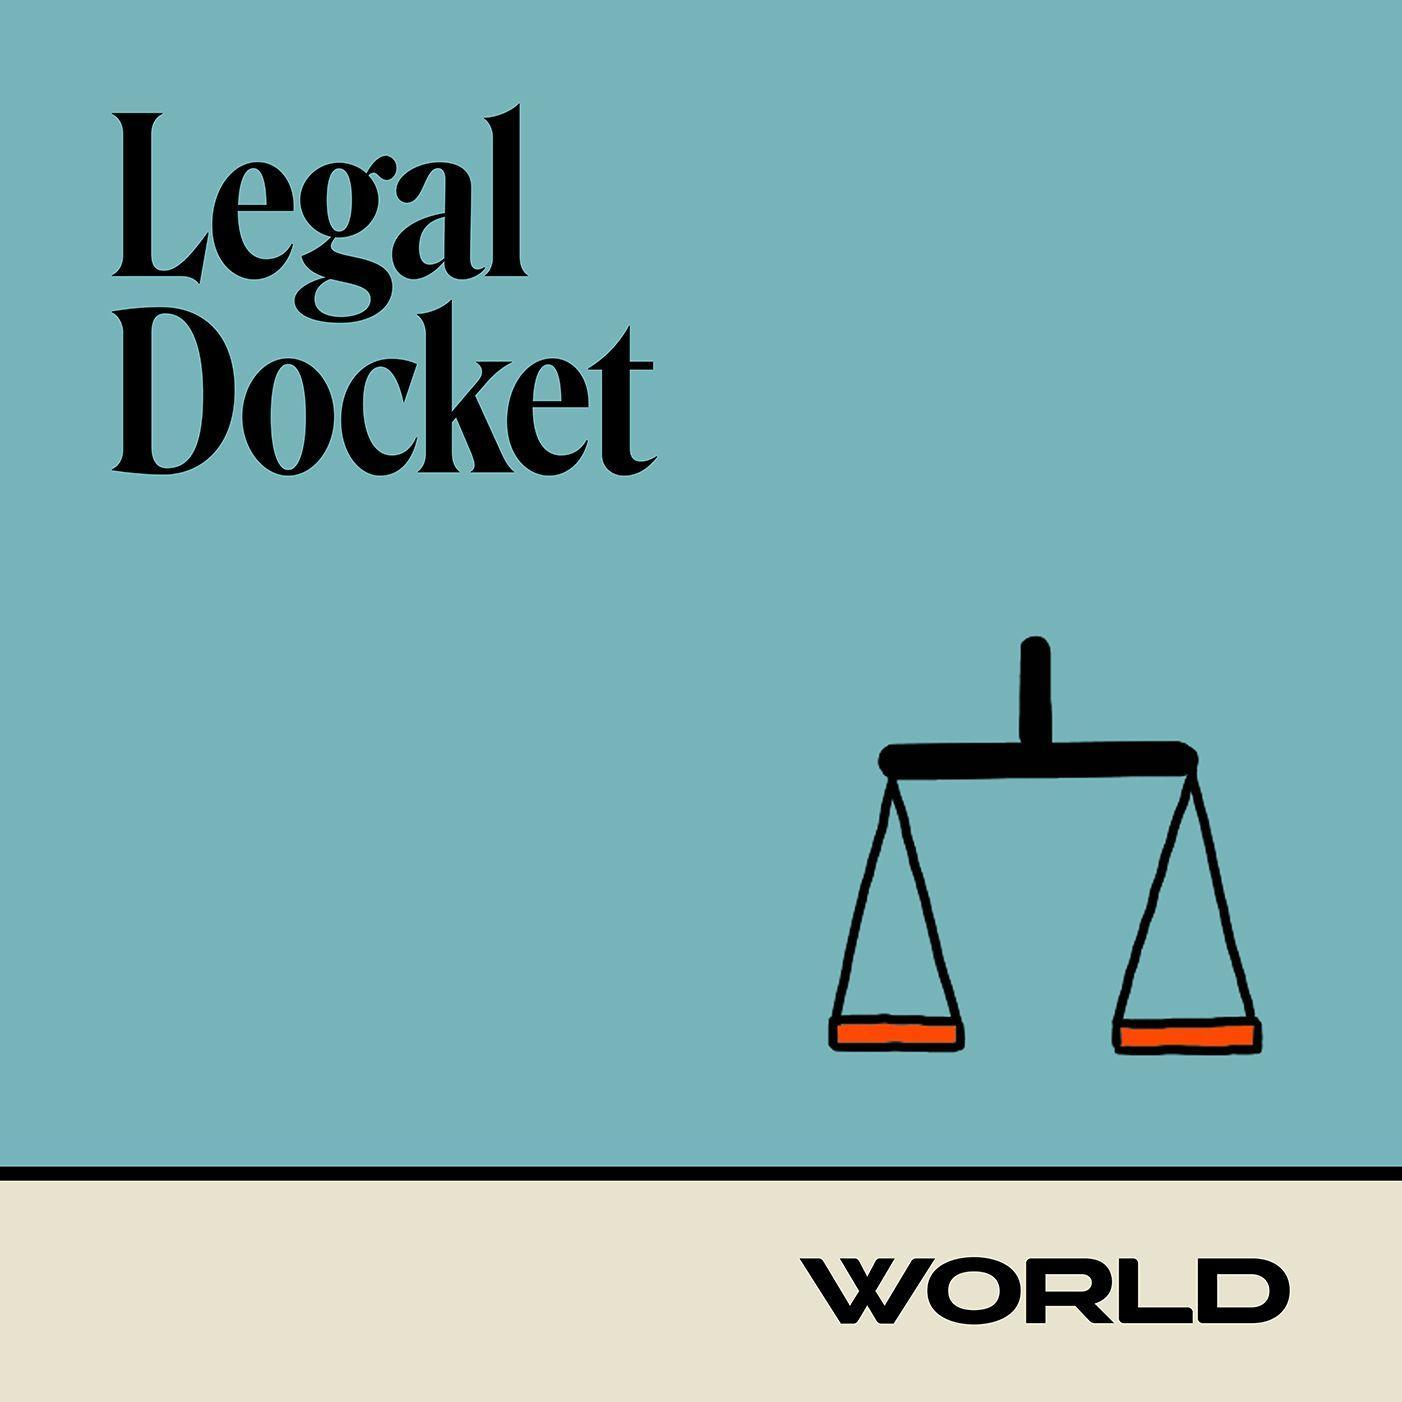 Legal Docket logo